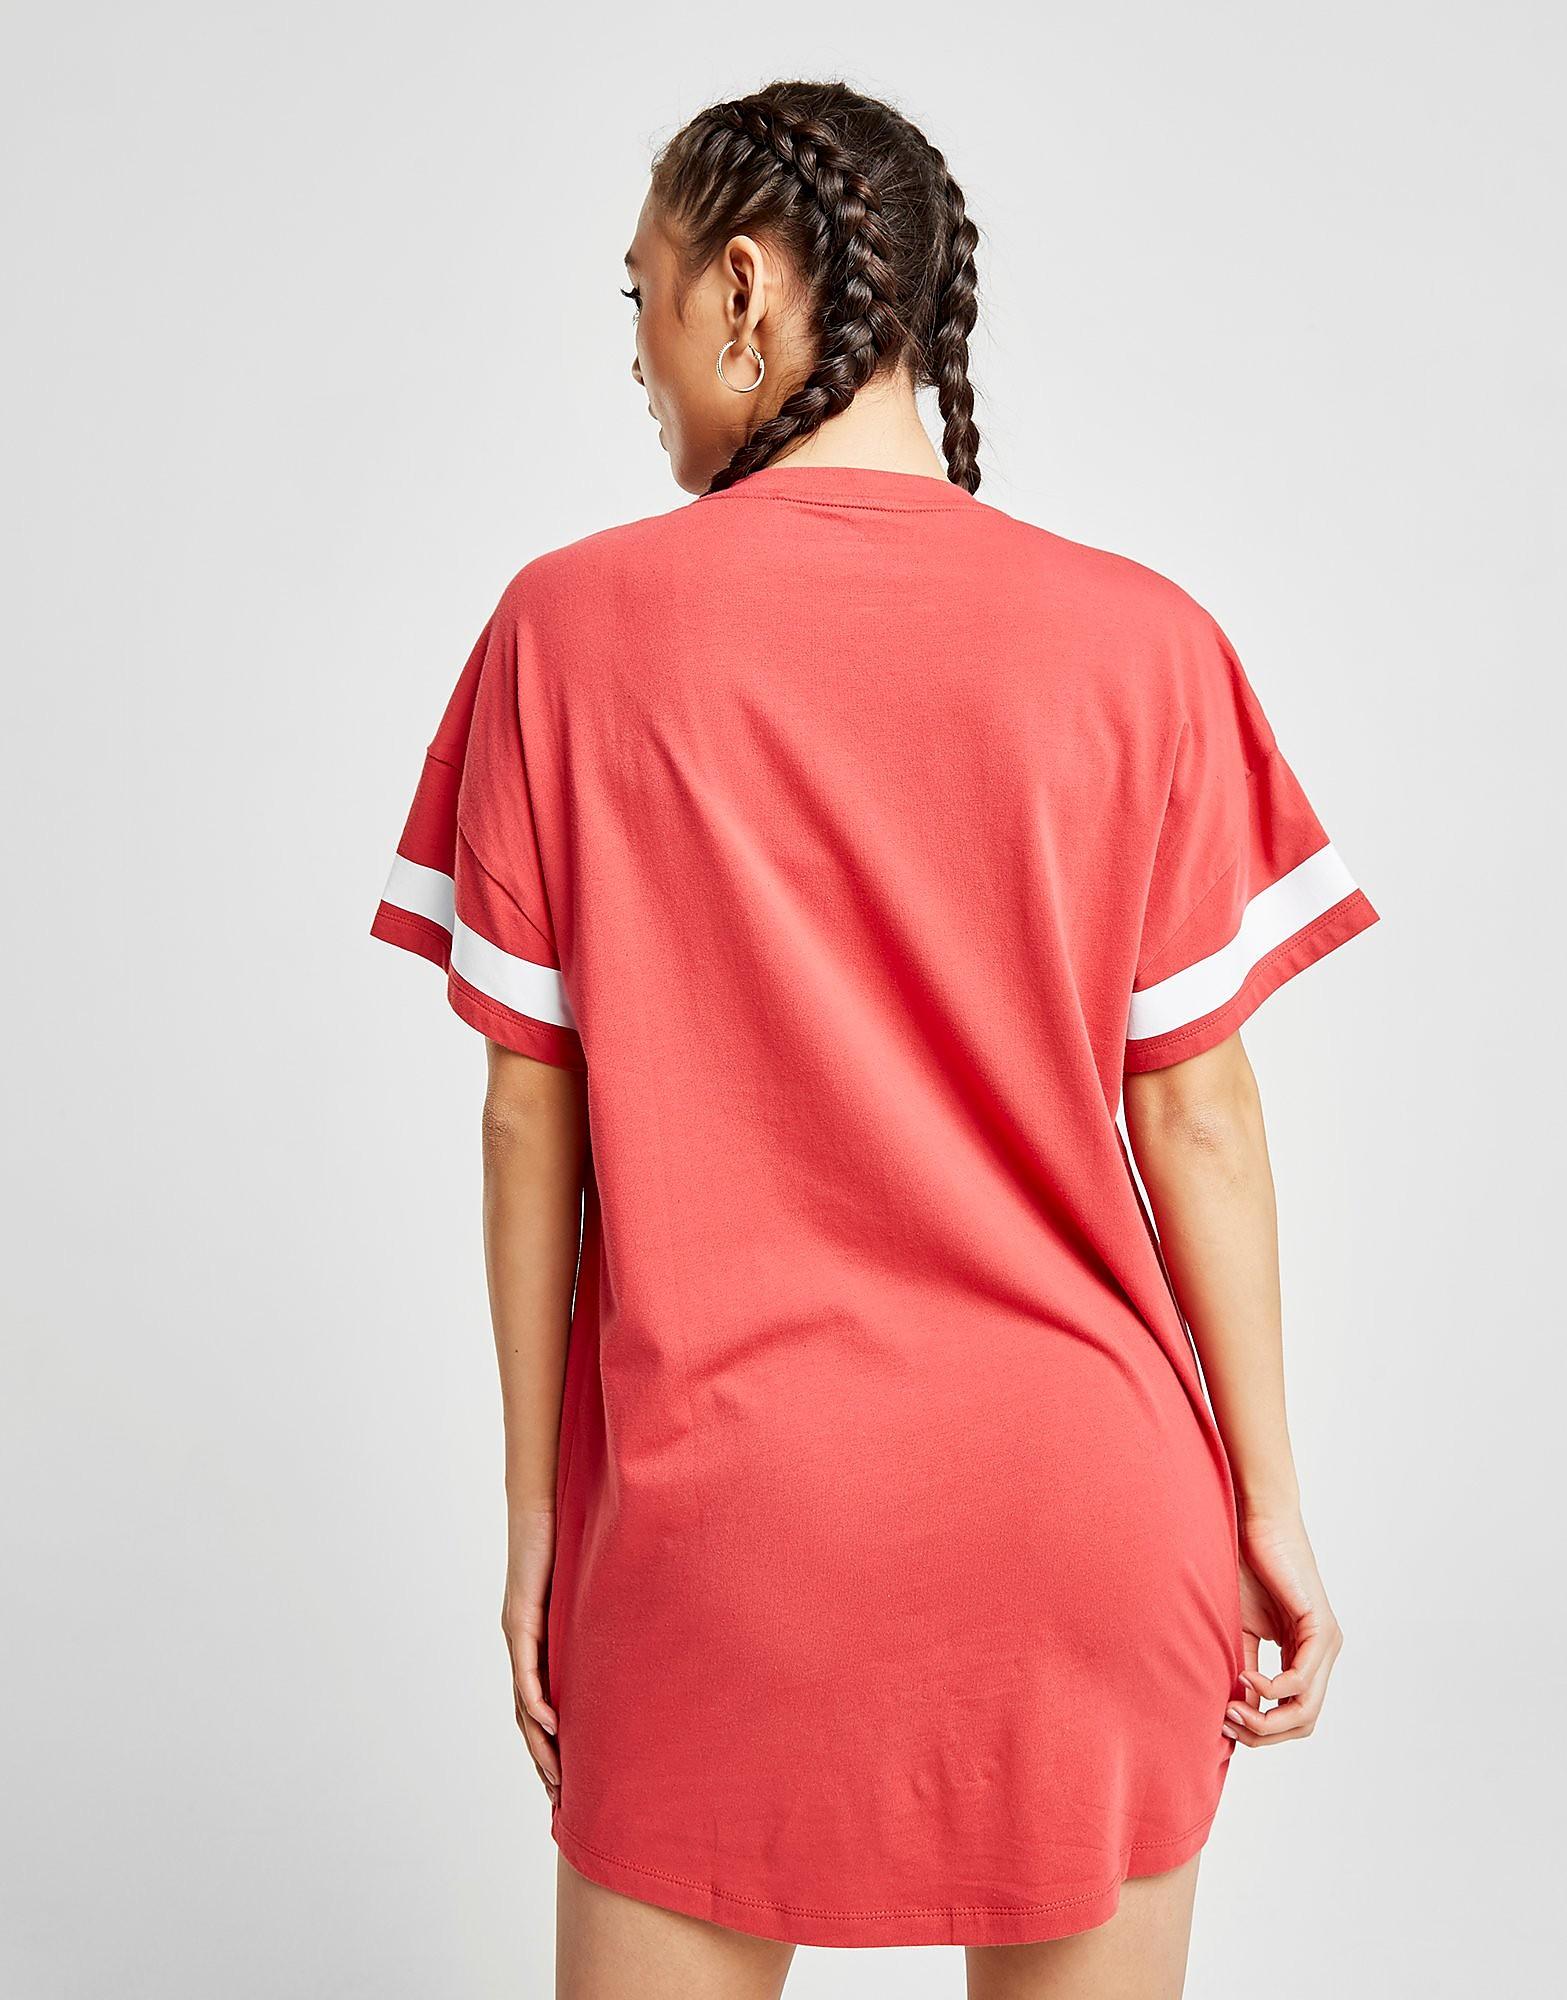 Tommy Hilfiger 85' Longline T-Shirt